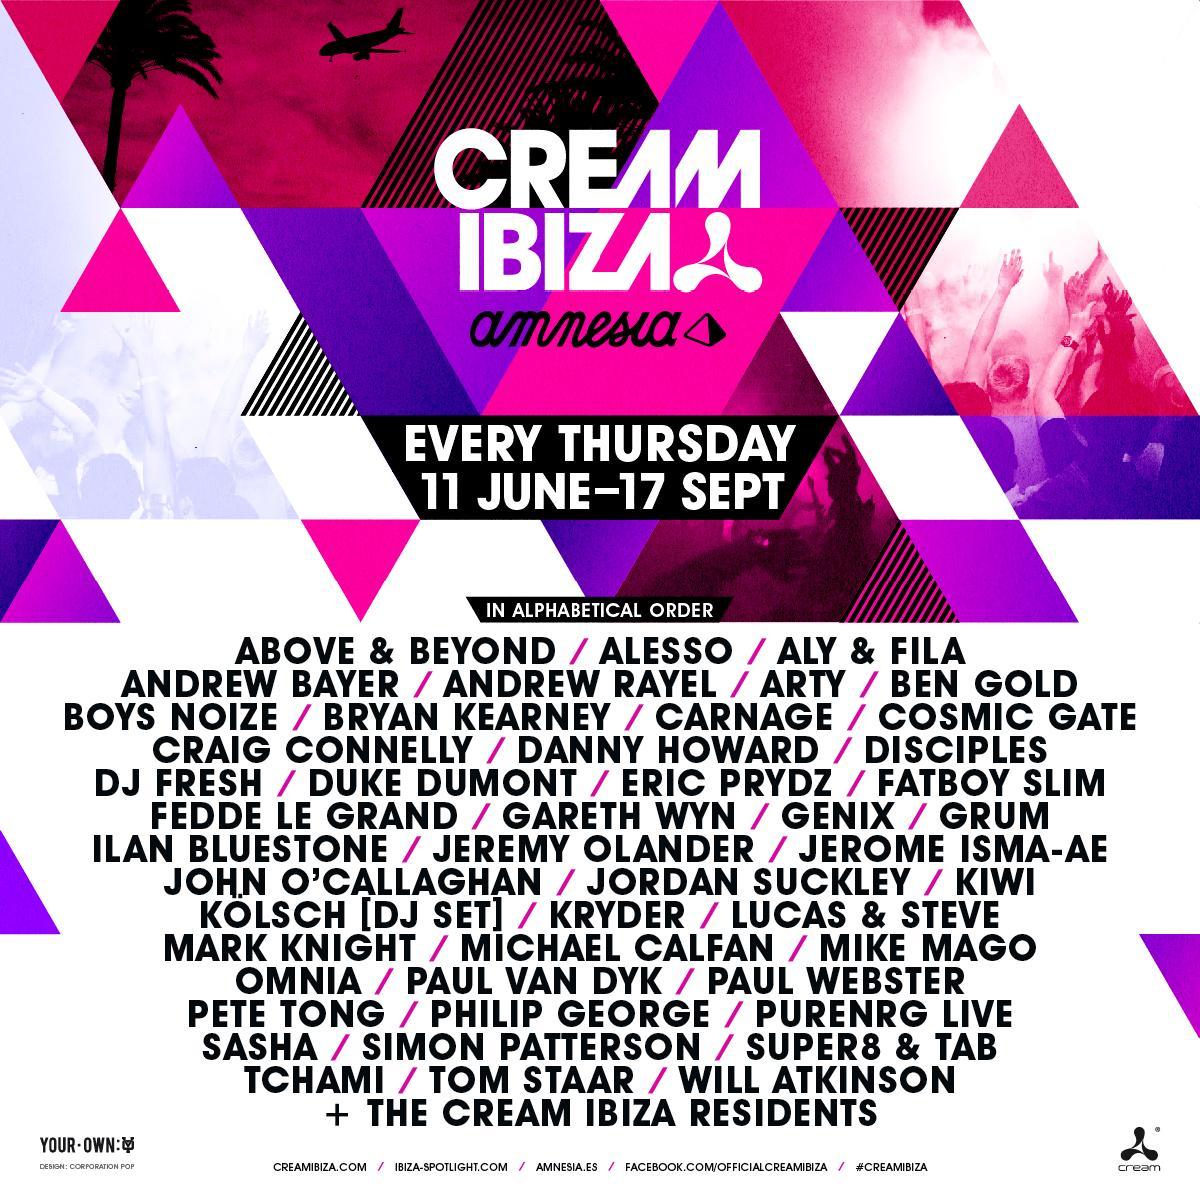 Cream ibiza line up 2015